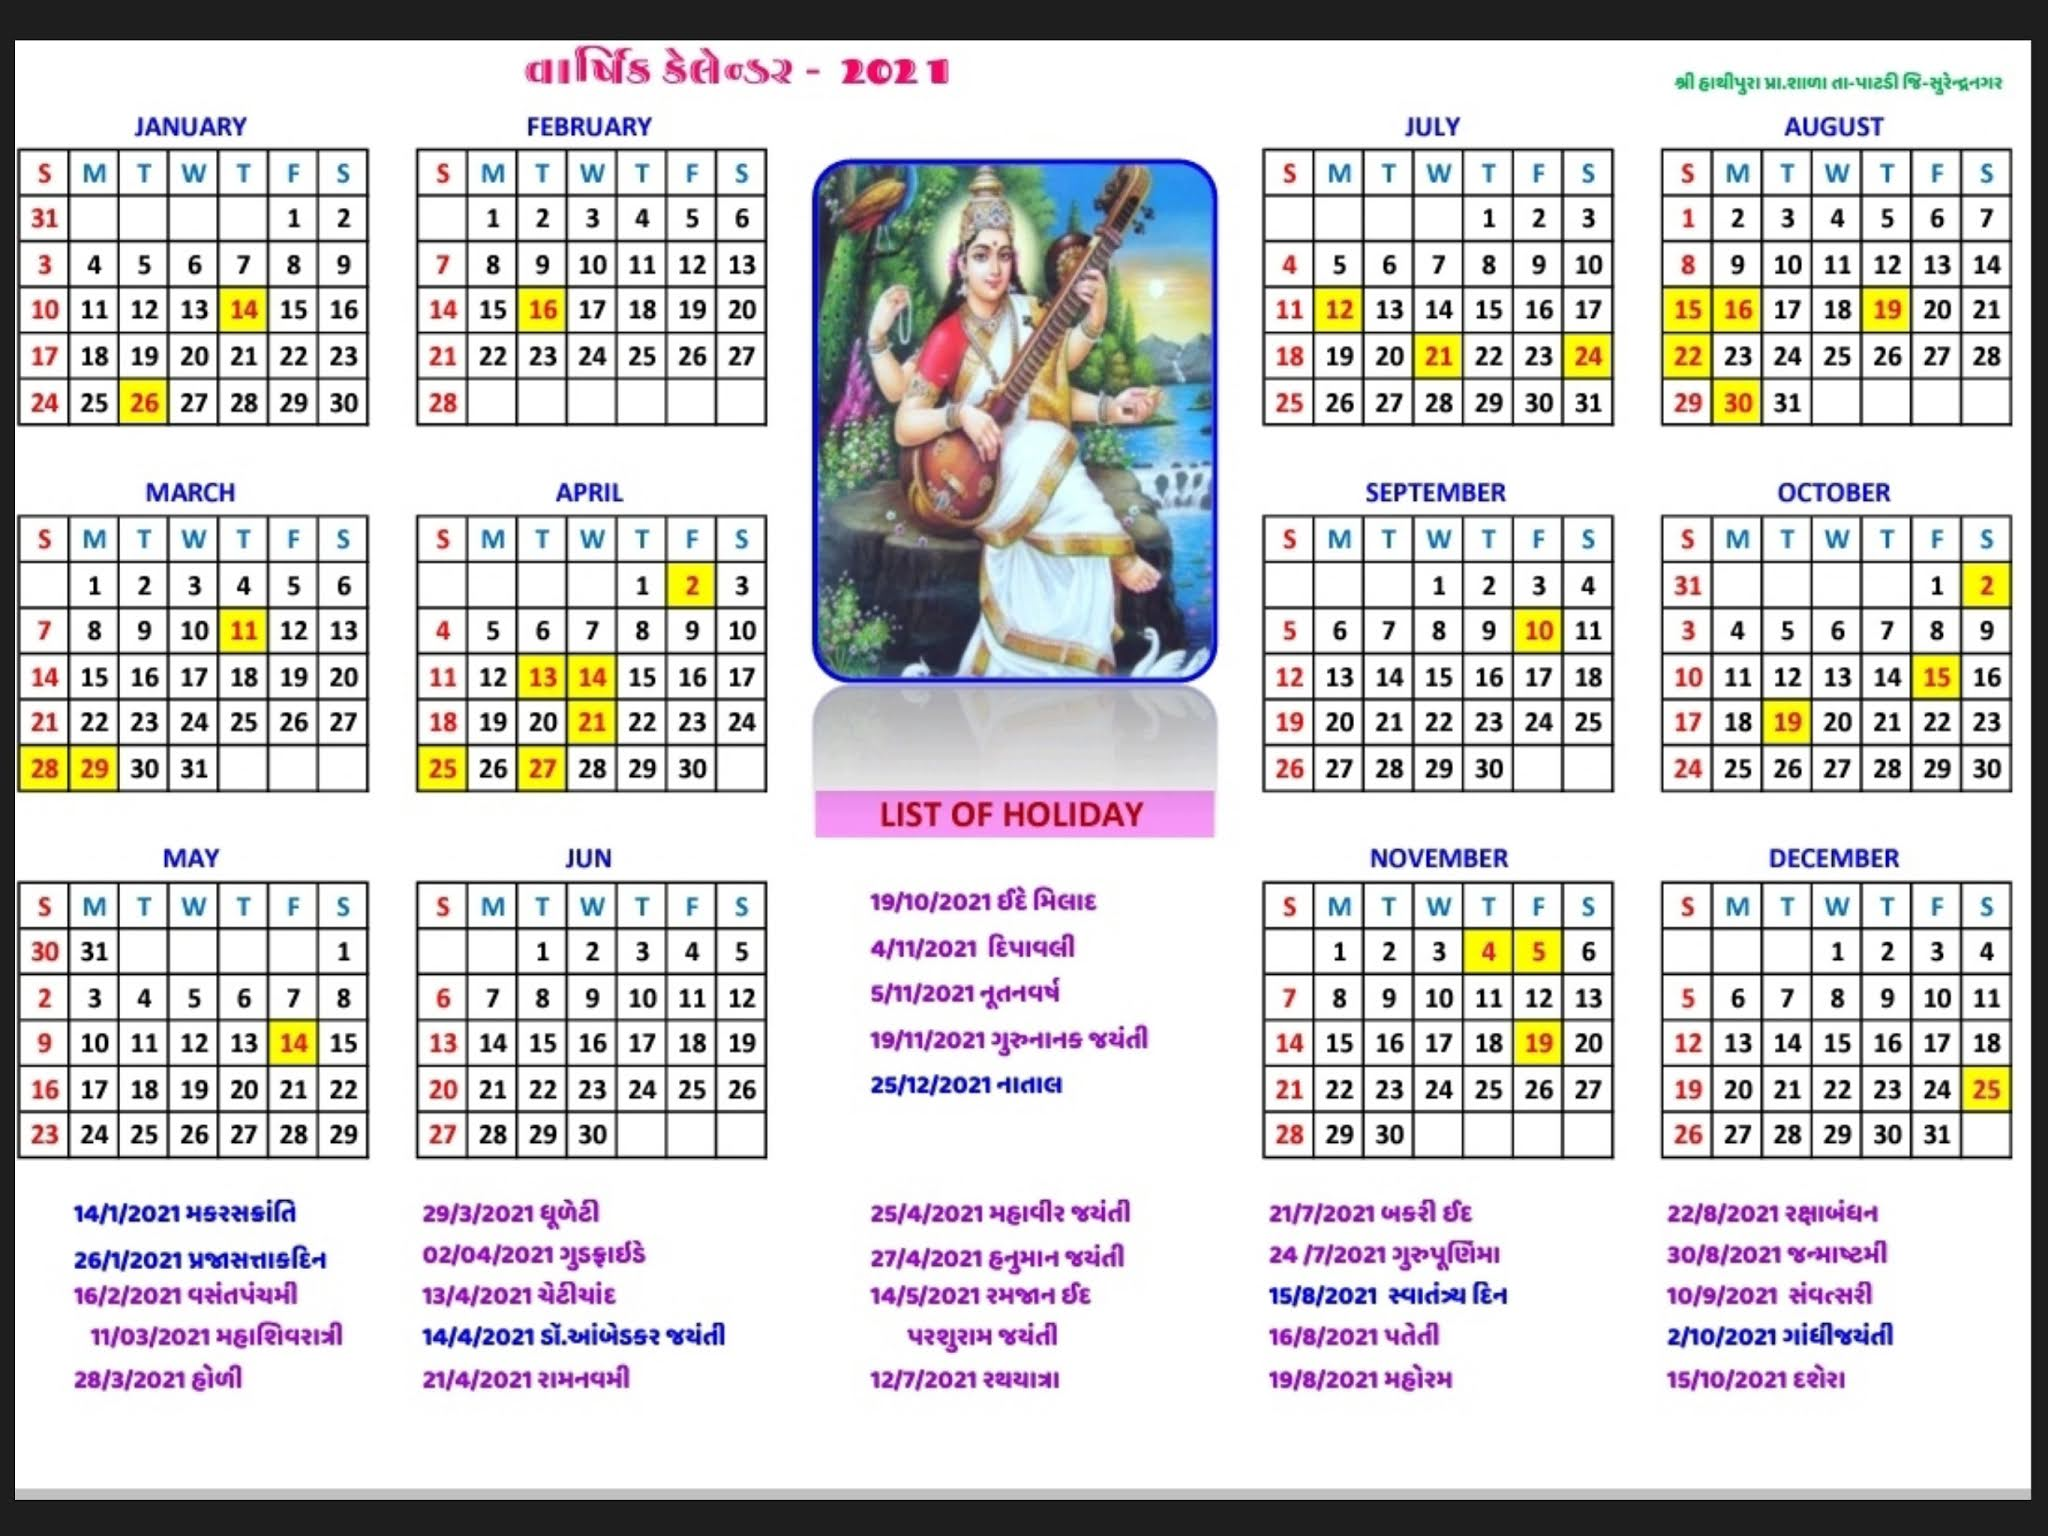 2021 Holiday Calendar Gujarat